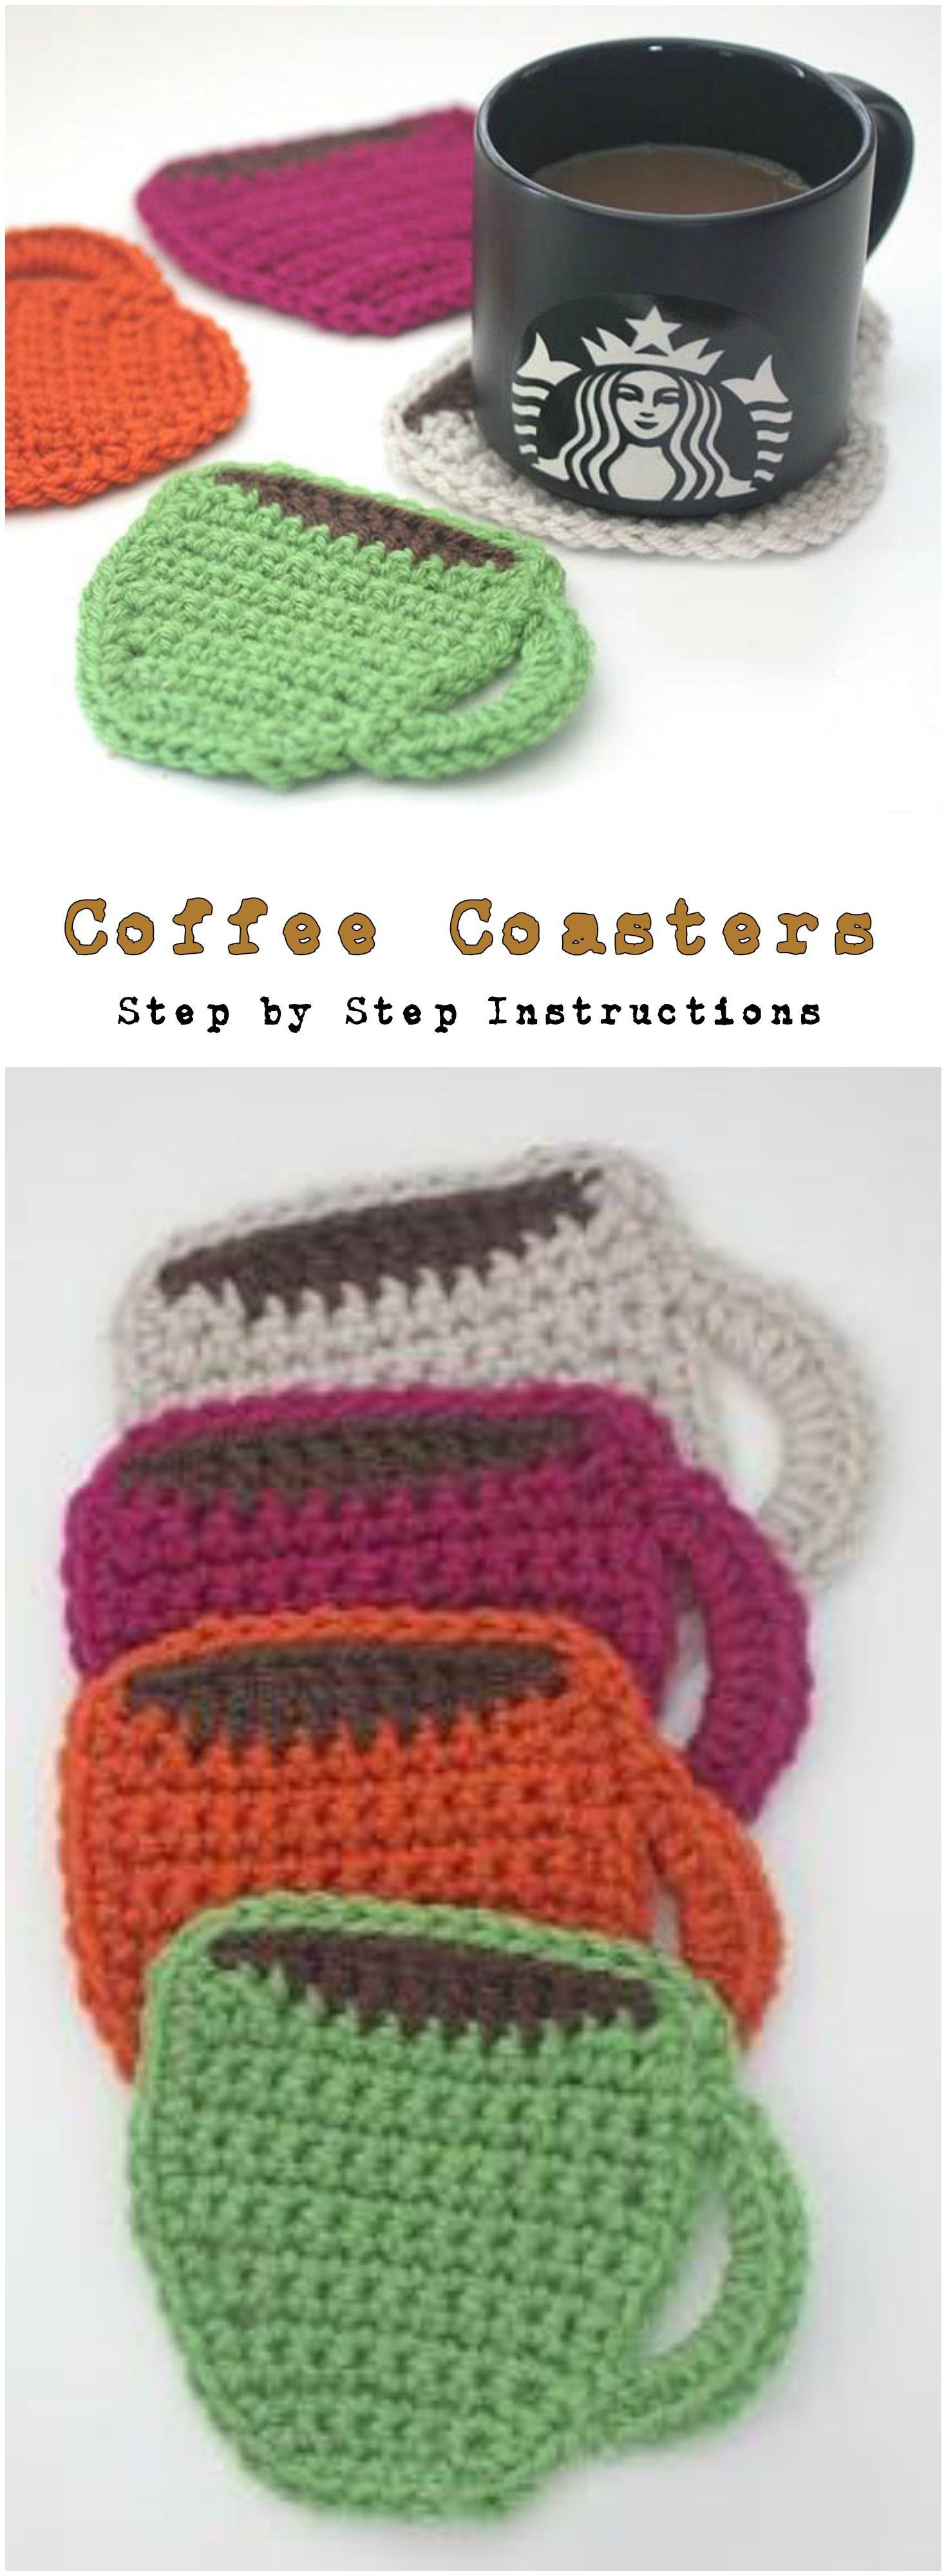 Crochet Coffee Coasters | Pinterest | Häkeln, Topflappen und ...